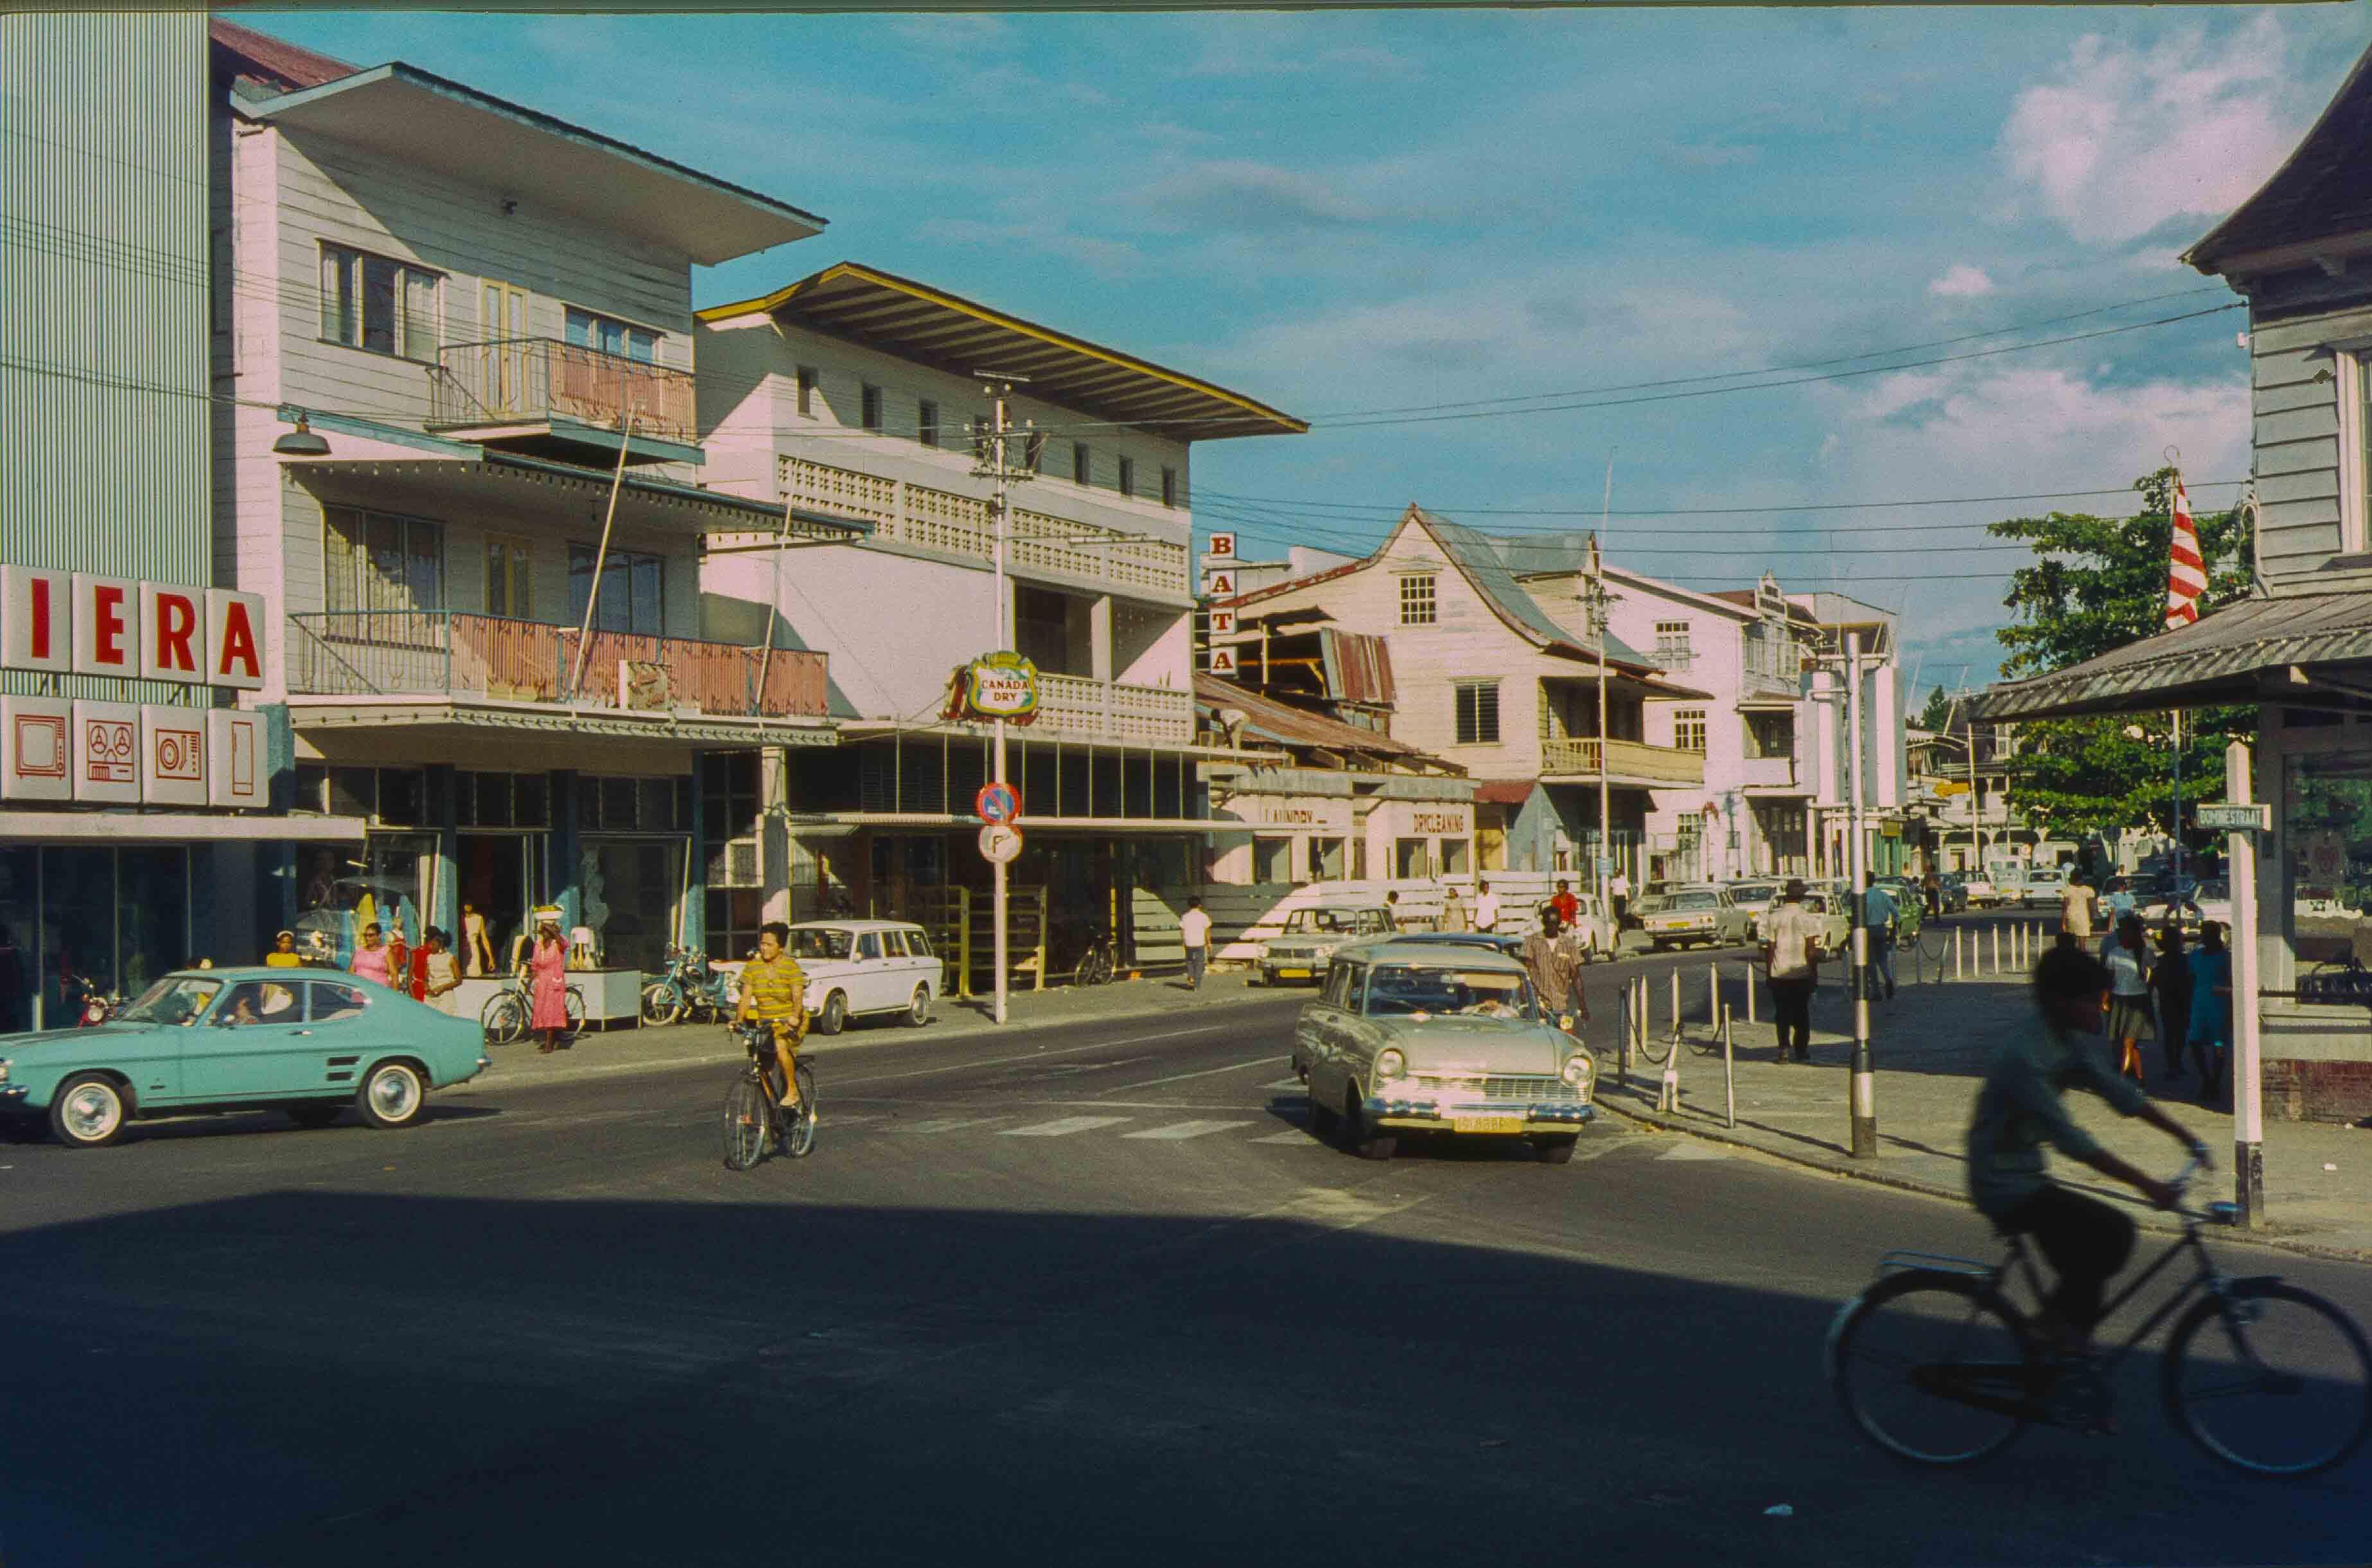 210. Suriname